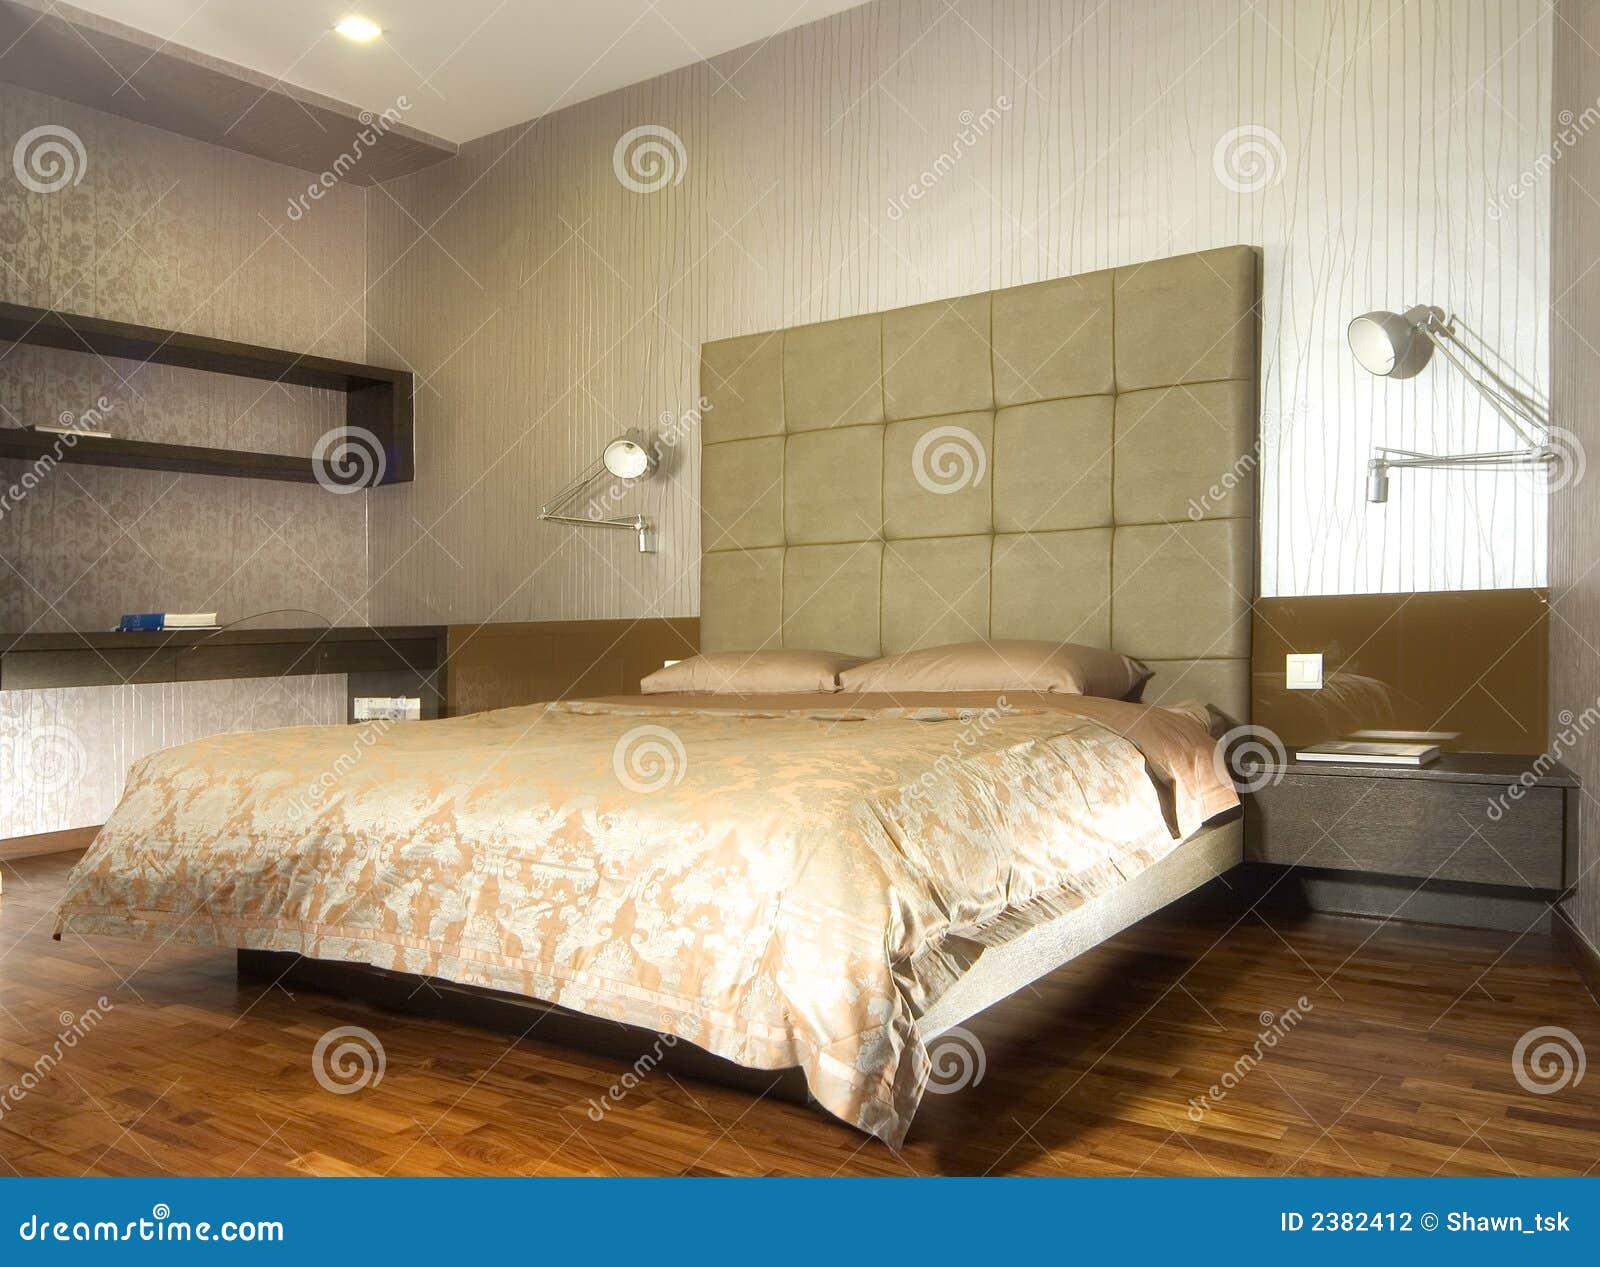 Dise o interior dormitorio fotograf a de archivo for Diseno dormitorio